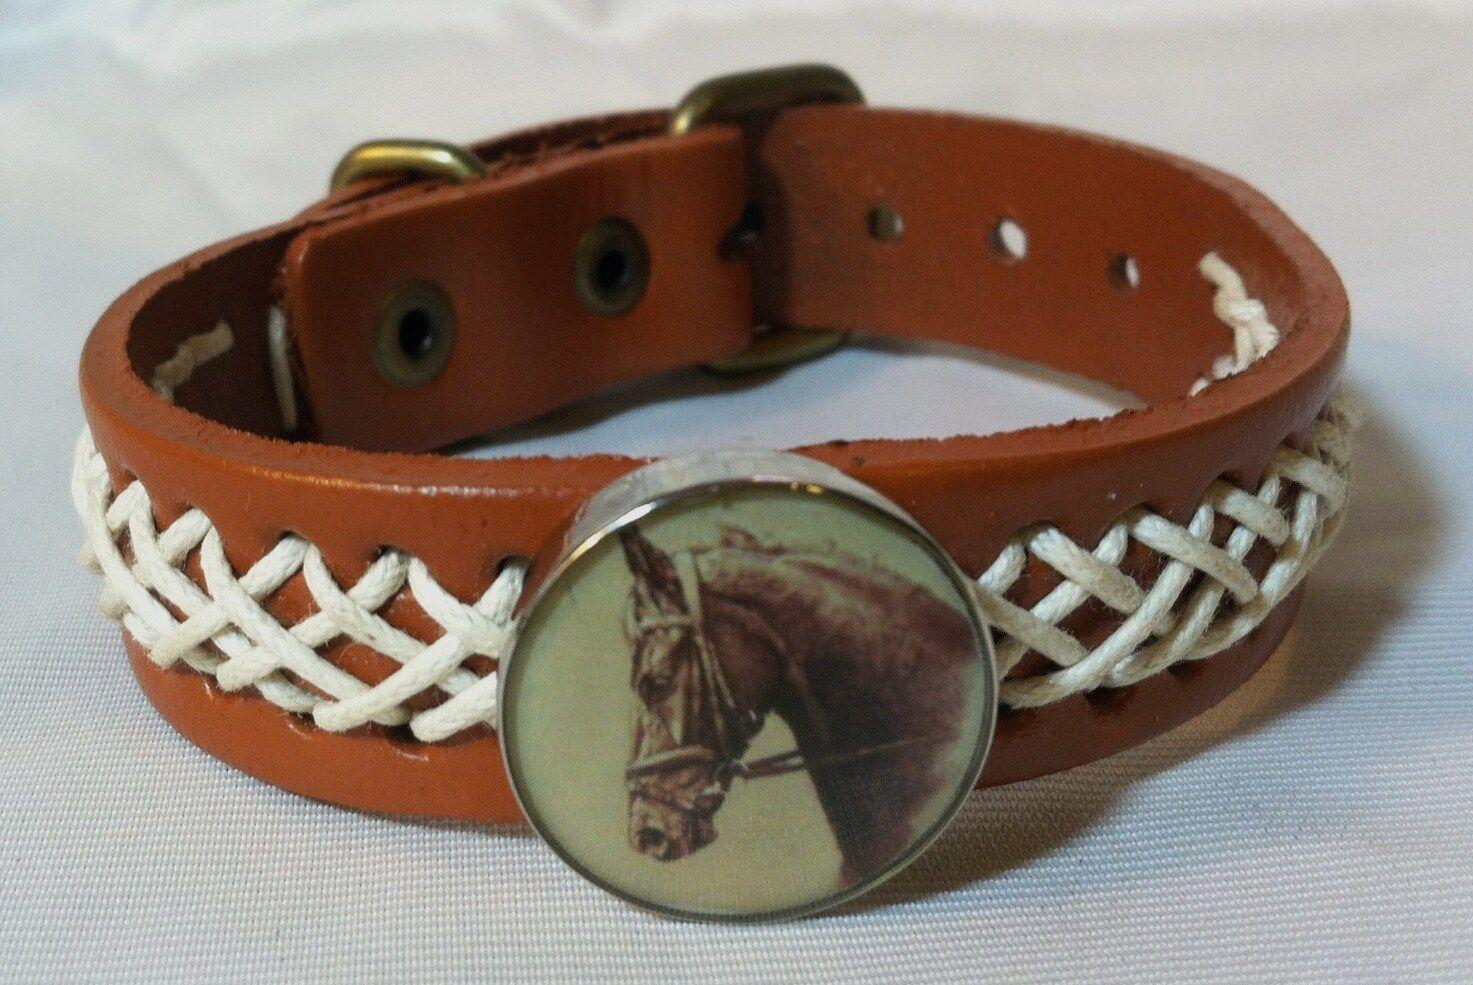 HORSE SNAP & LEATHER twine stitch BRACELET 18-20MM YOUNG RACE HORSE BUBBLES